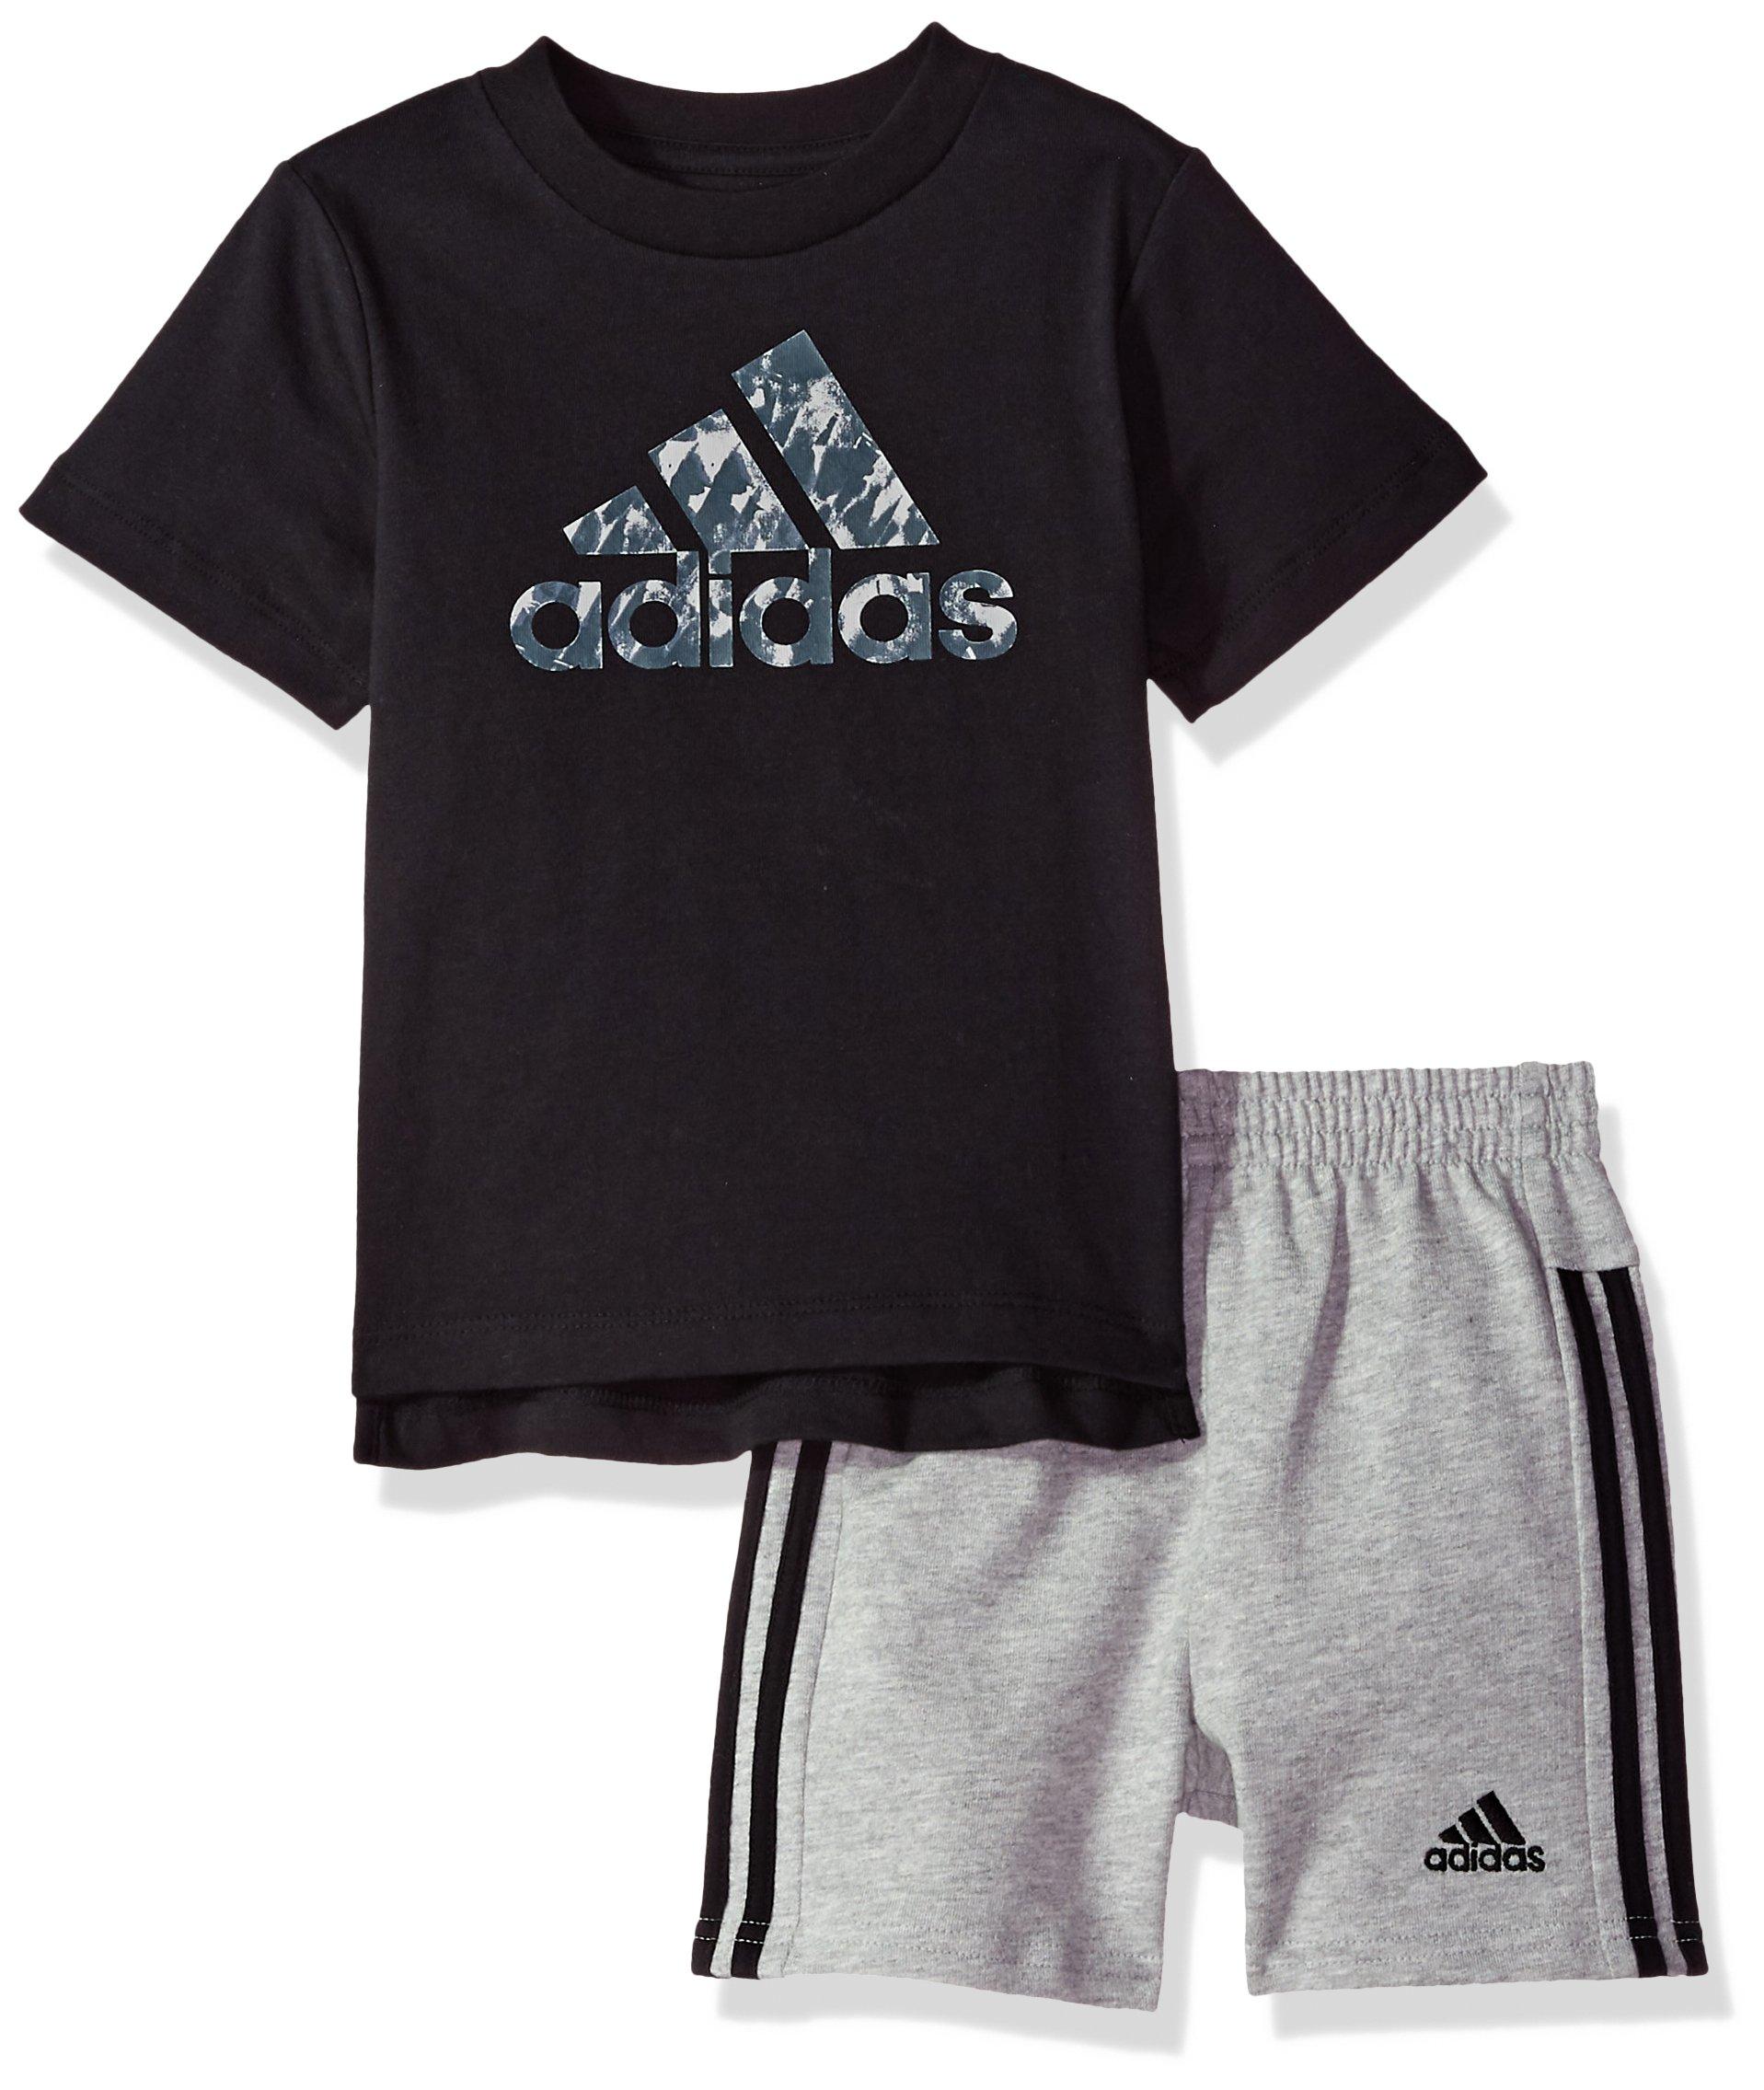 adidas Baby Boys Short Sleeve Tee and Short Set, Black Adi, 18M